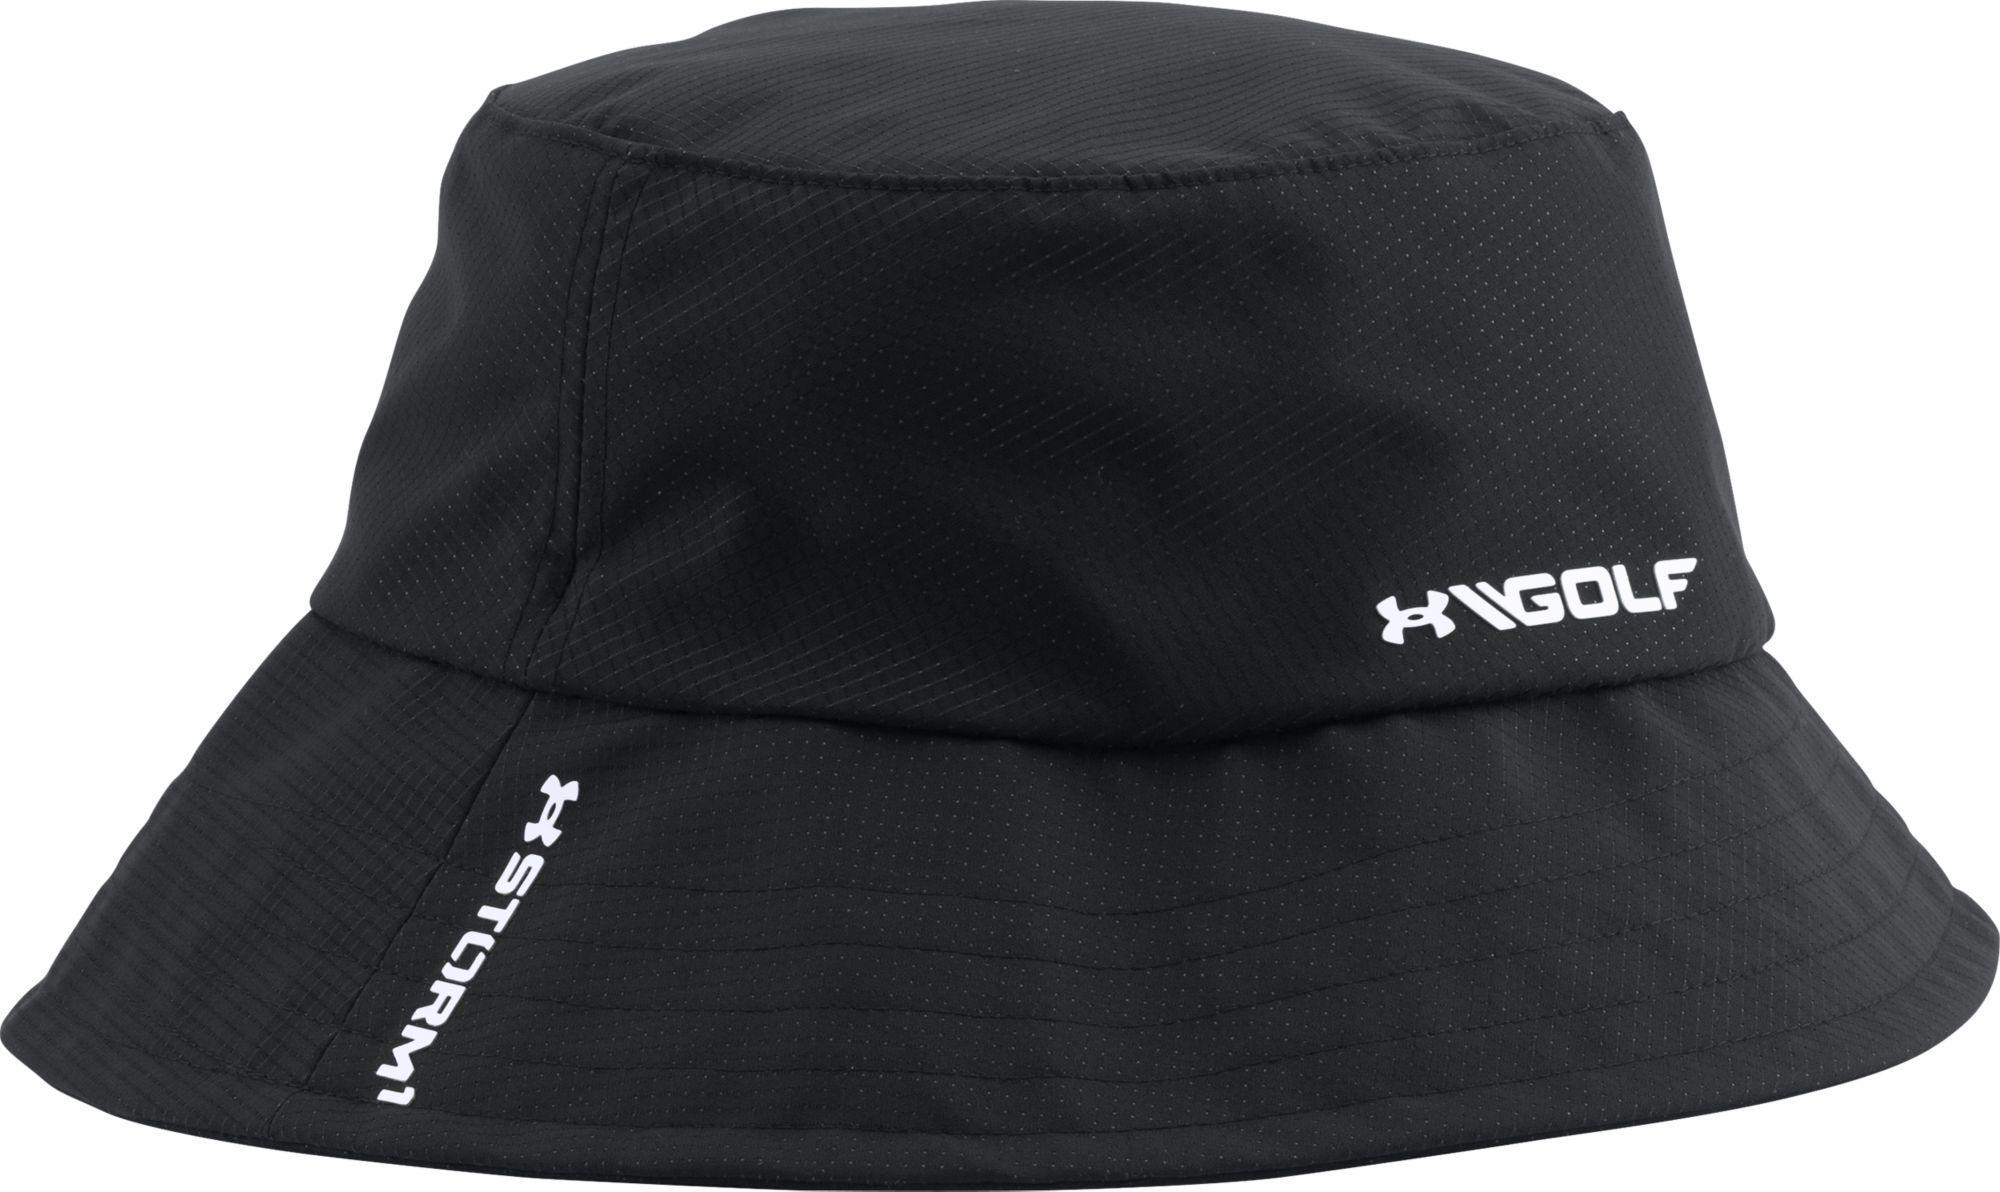 db3d842c91670 Lyst - Under Armour Ucket Golf Hat in Black for Men